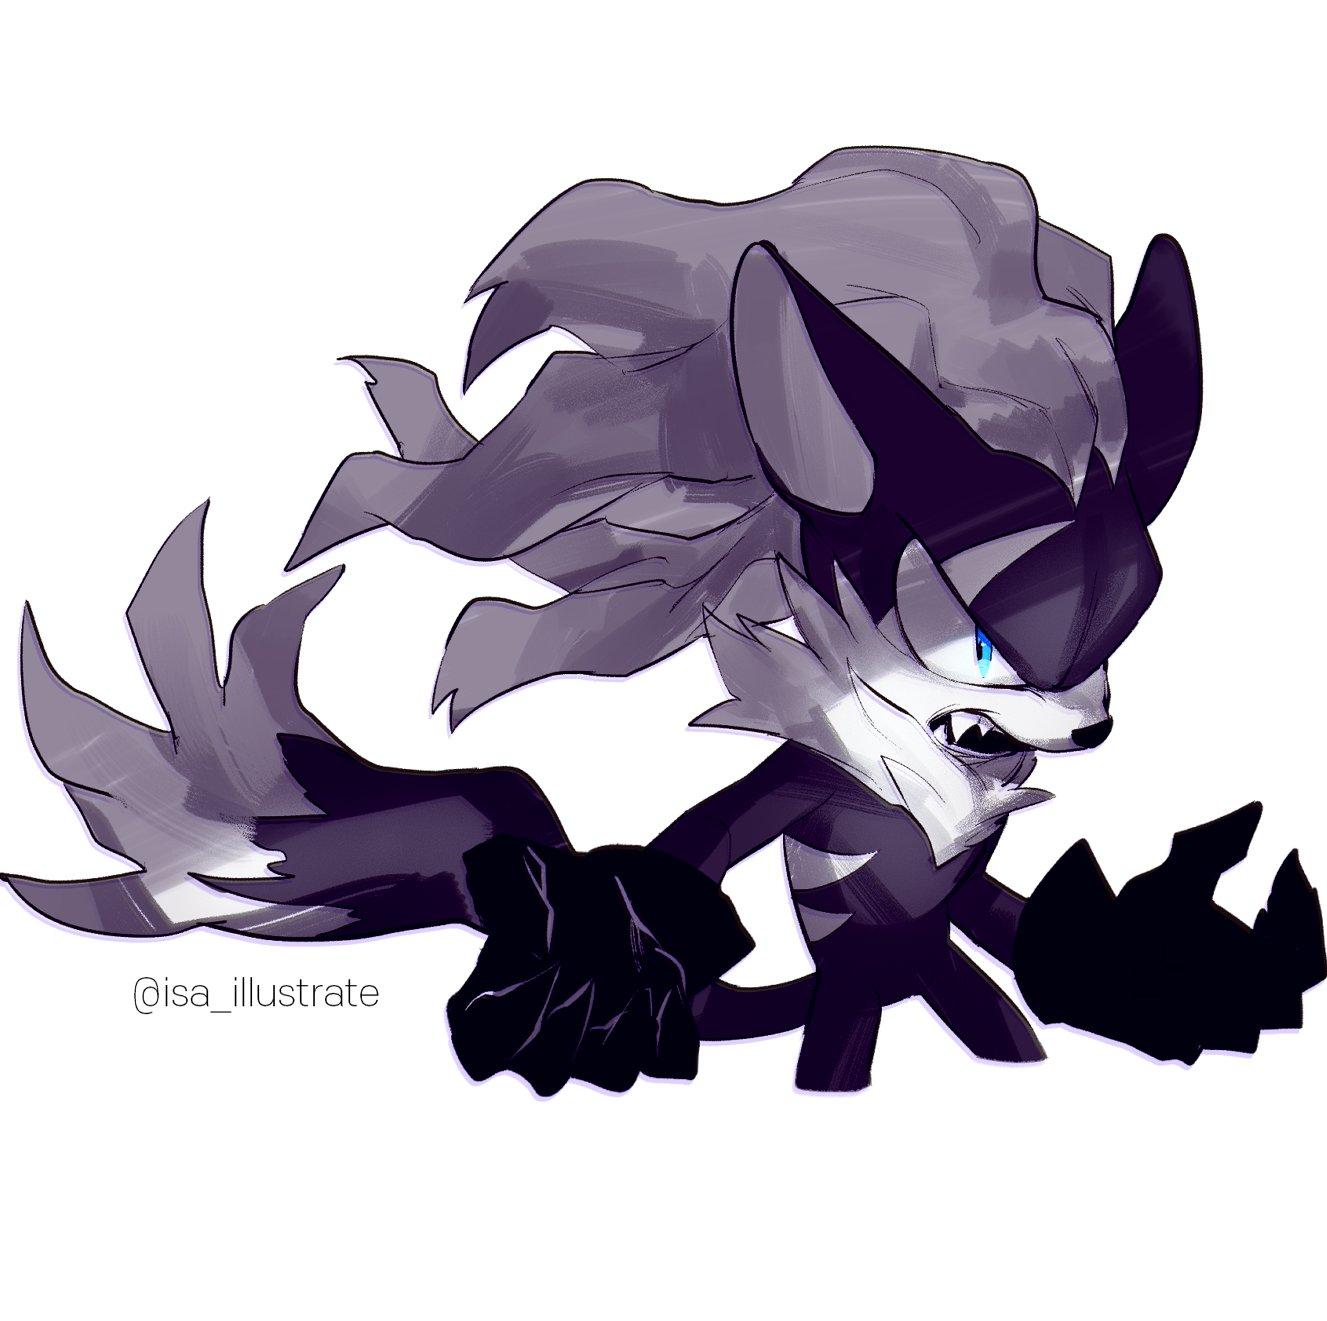 Infinite Sonic The Hedgehog And 1 More Drawn By Isa 415810 Danbooru